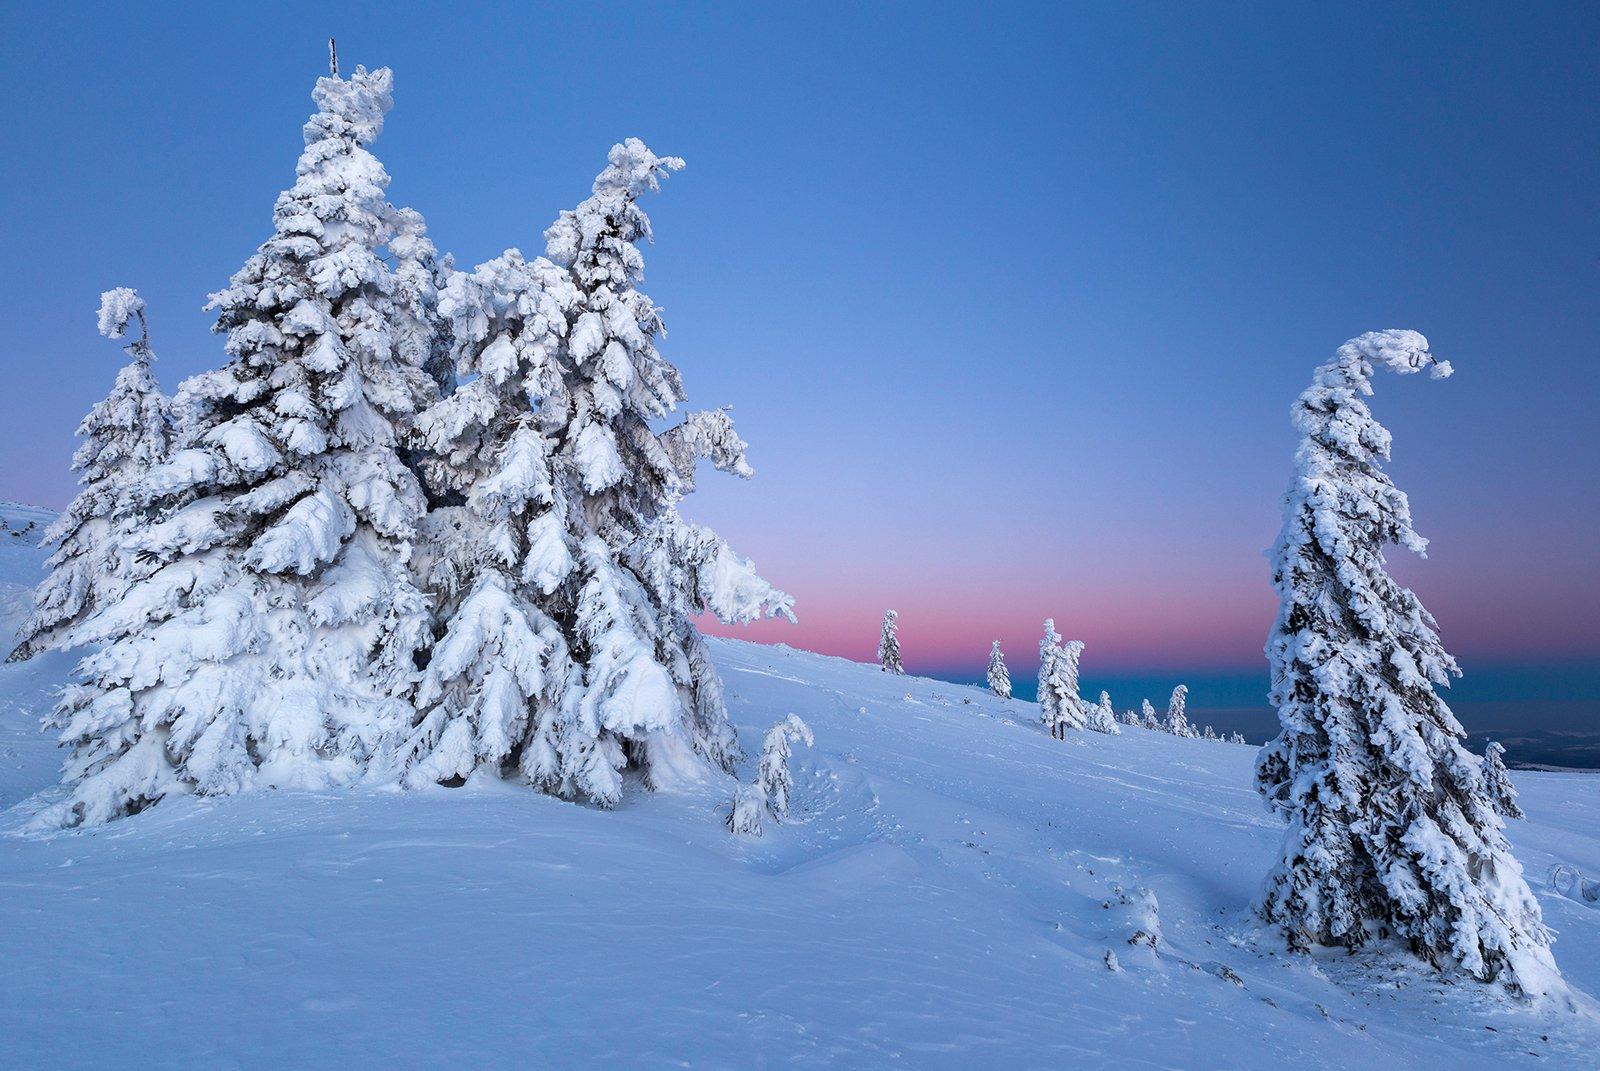 winter, trees, blizzard, snow, landscape, travel, nature, mountain, romania, cold, sunrise, Lazar Ioan Ovidiu